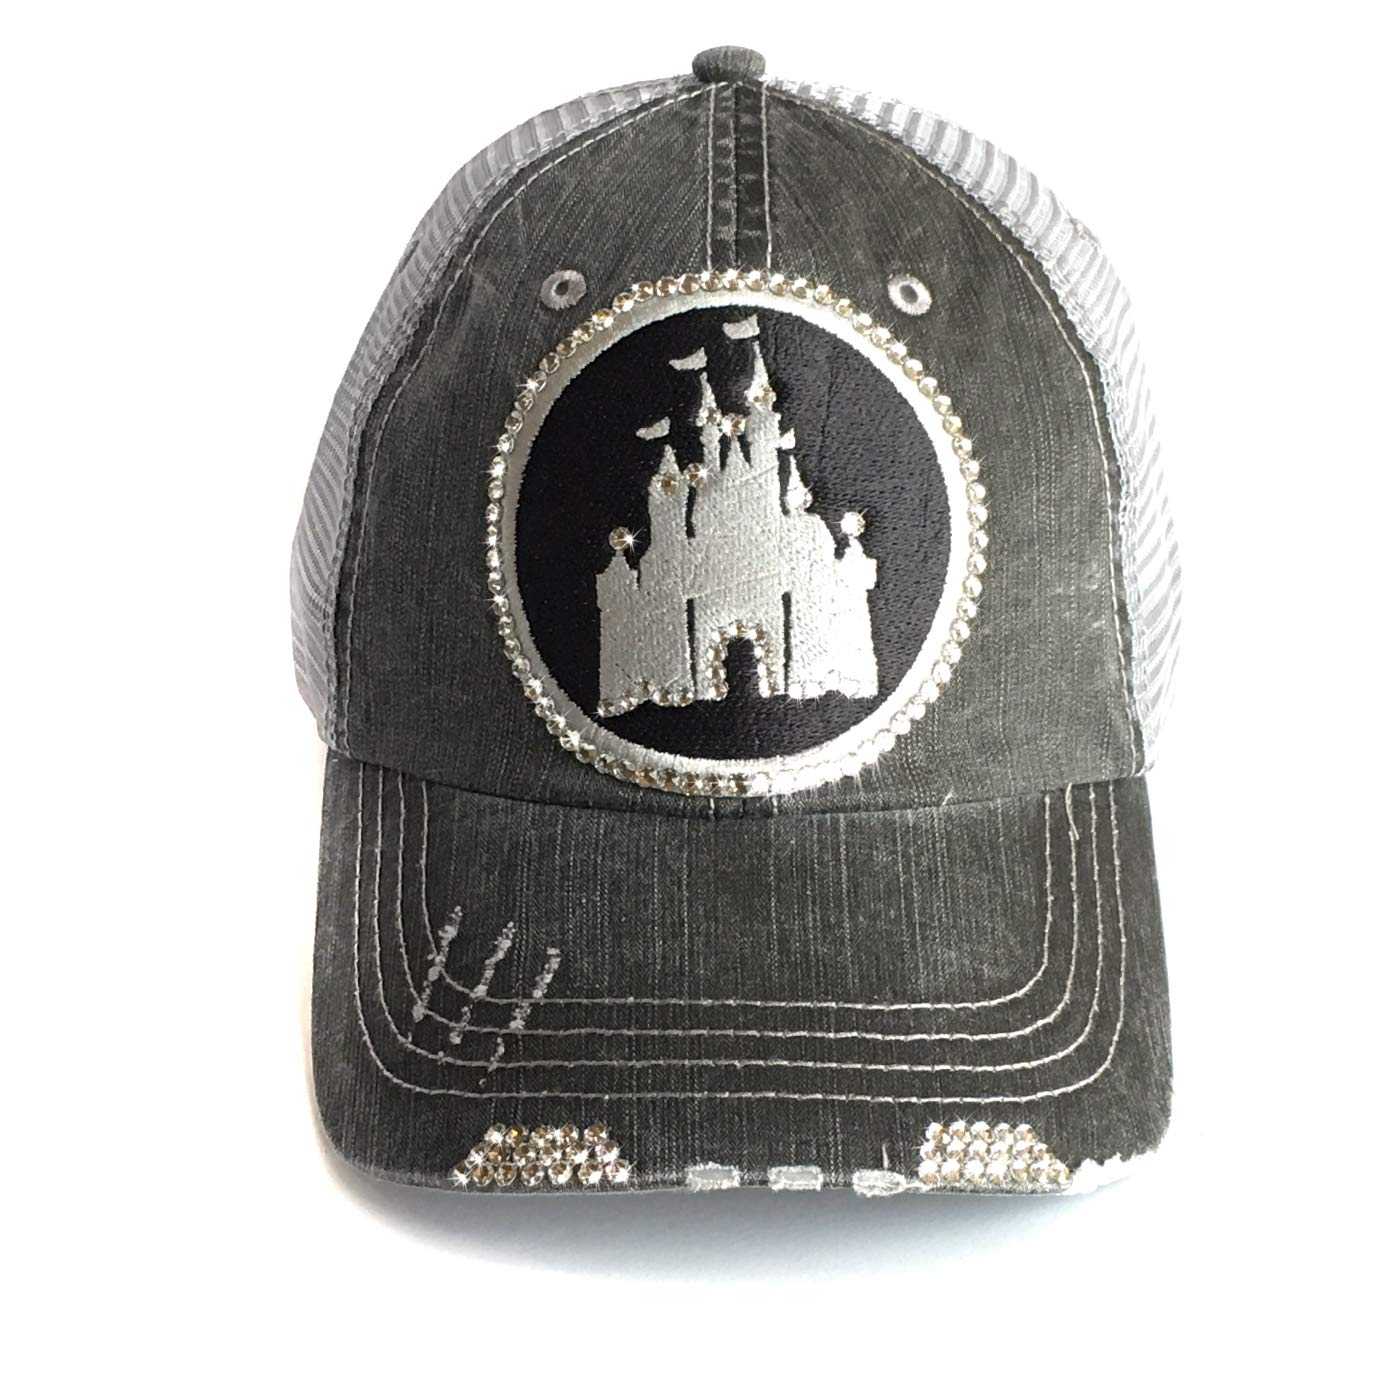 Disney High Ponytail Hat Bedazzled Mesh Baseball Cap Swarovski Crystal Bling Gray by Elivata (Image #1)